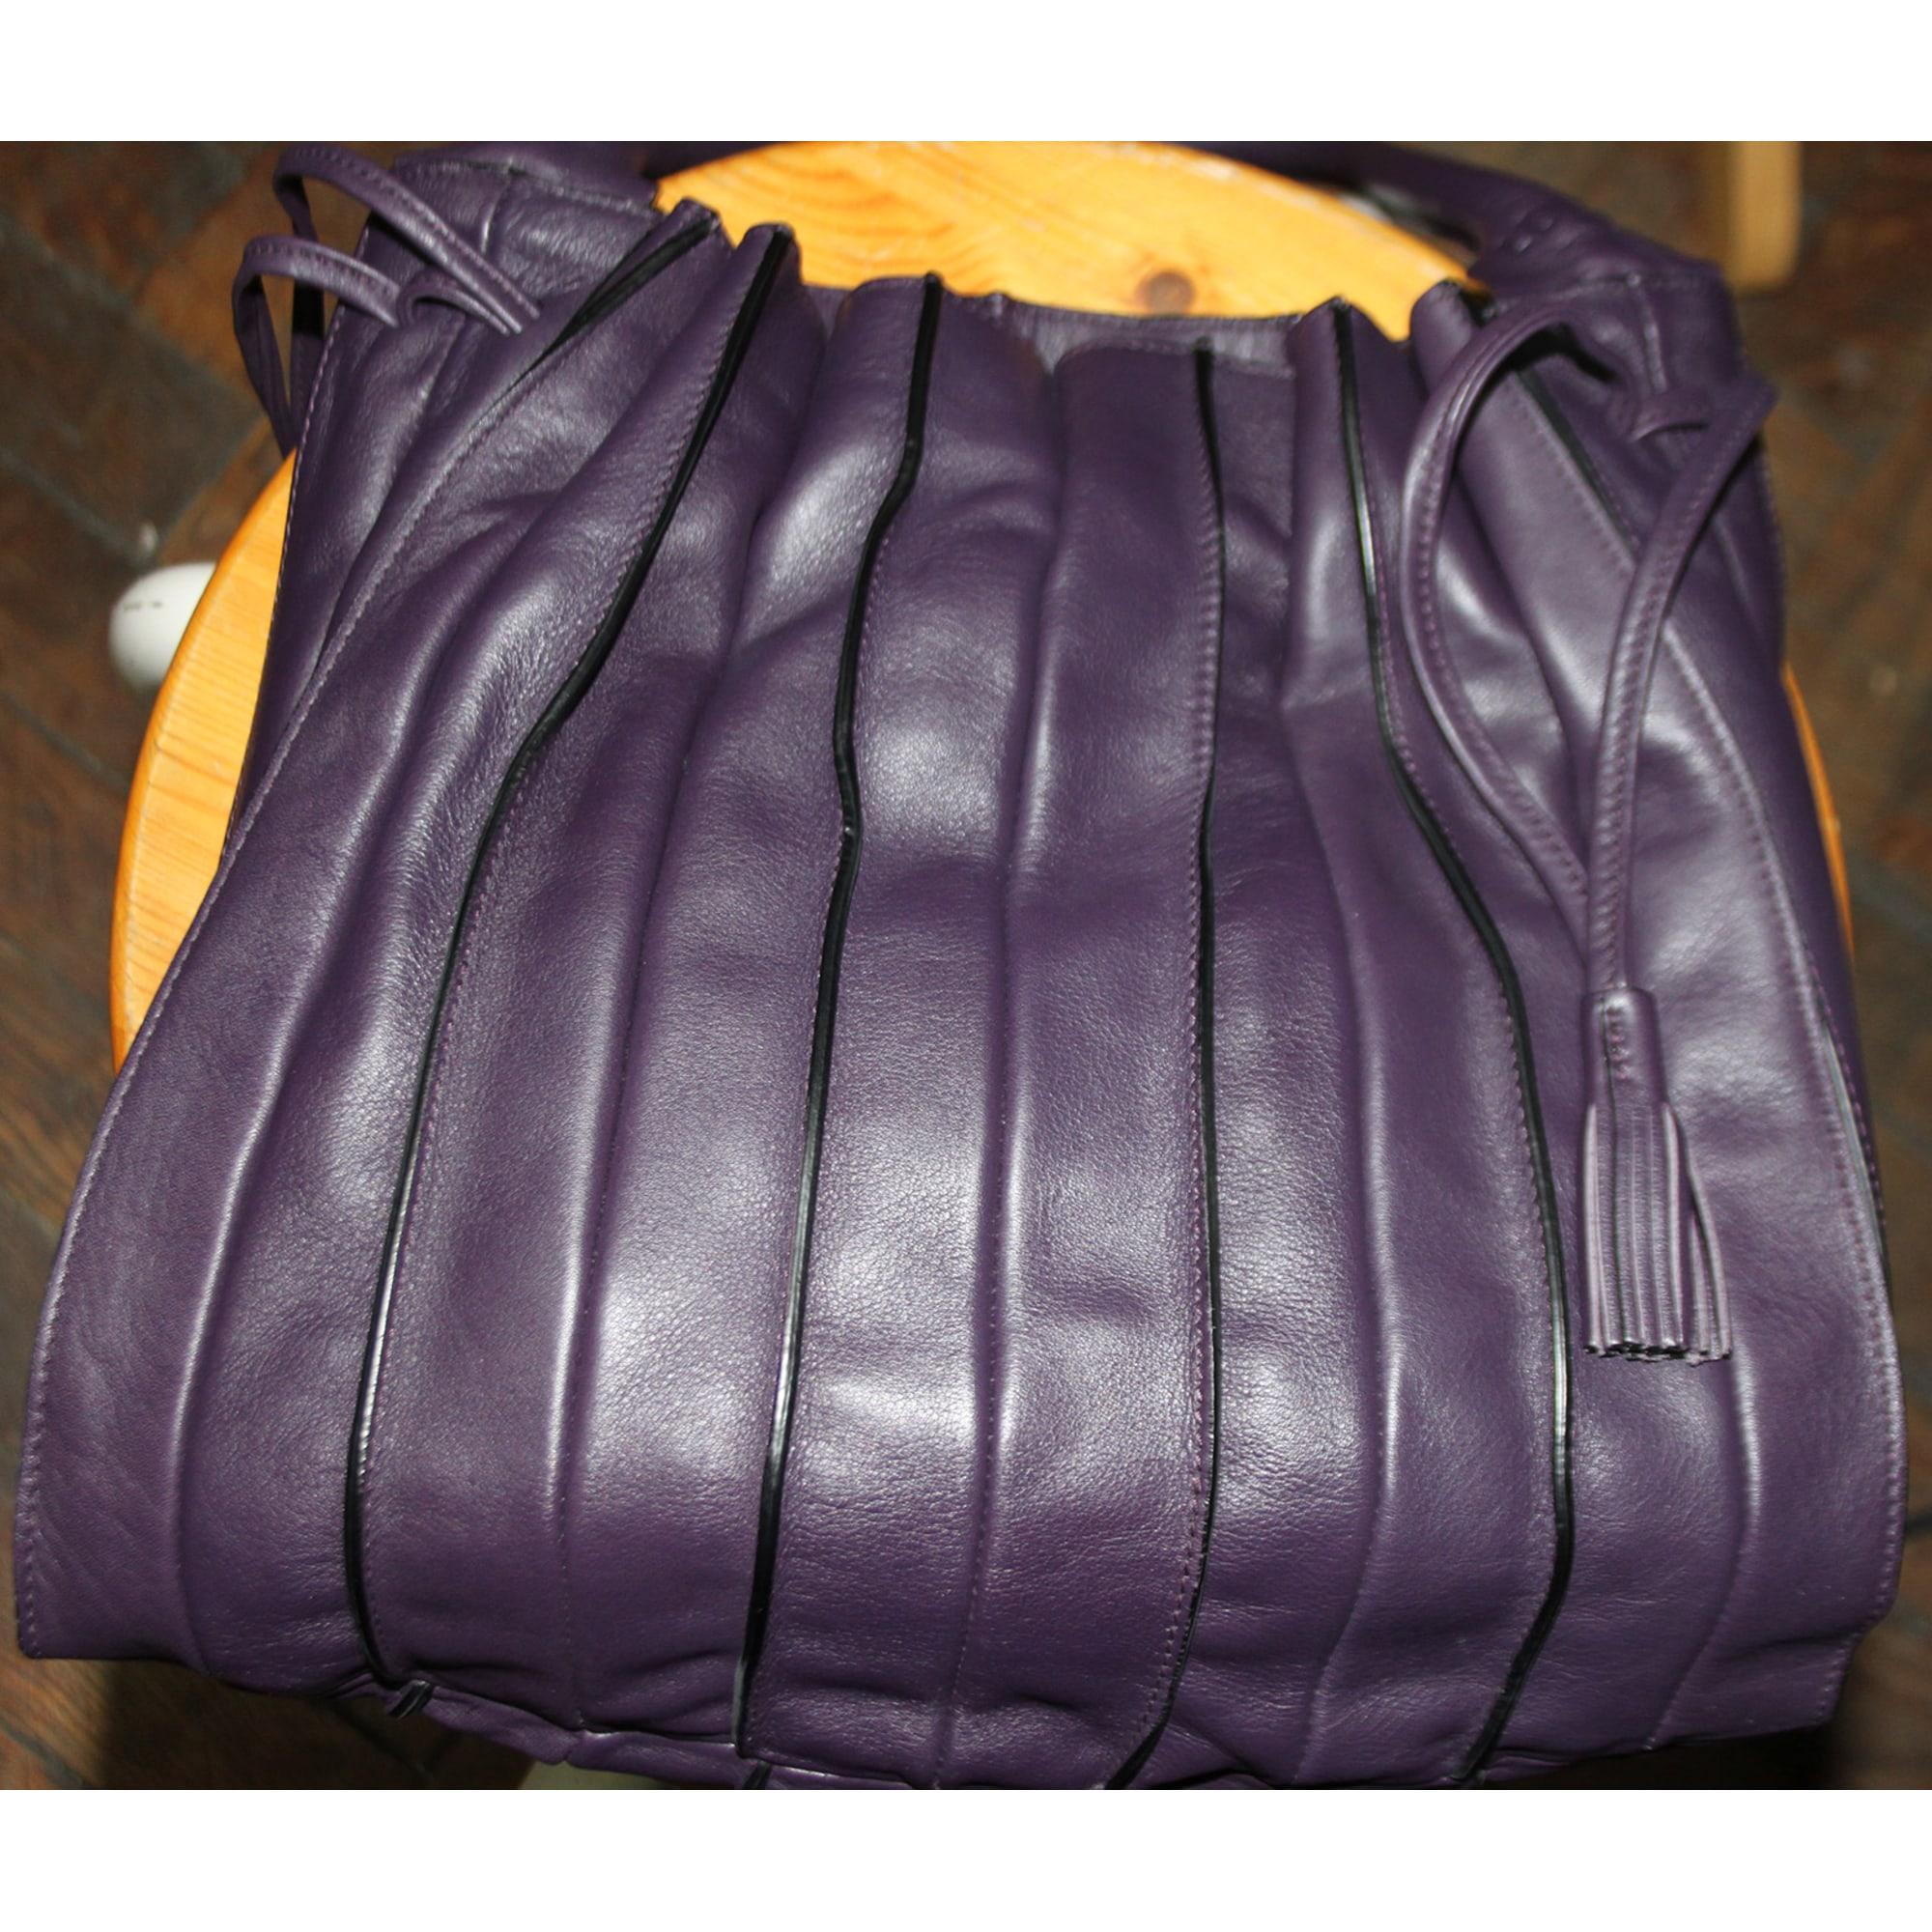 Sac à main en cuir LUPO BARCELONA cuir violet jU3Hkx